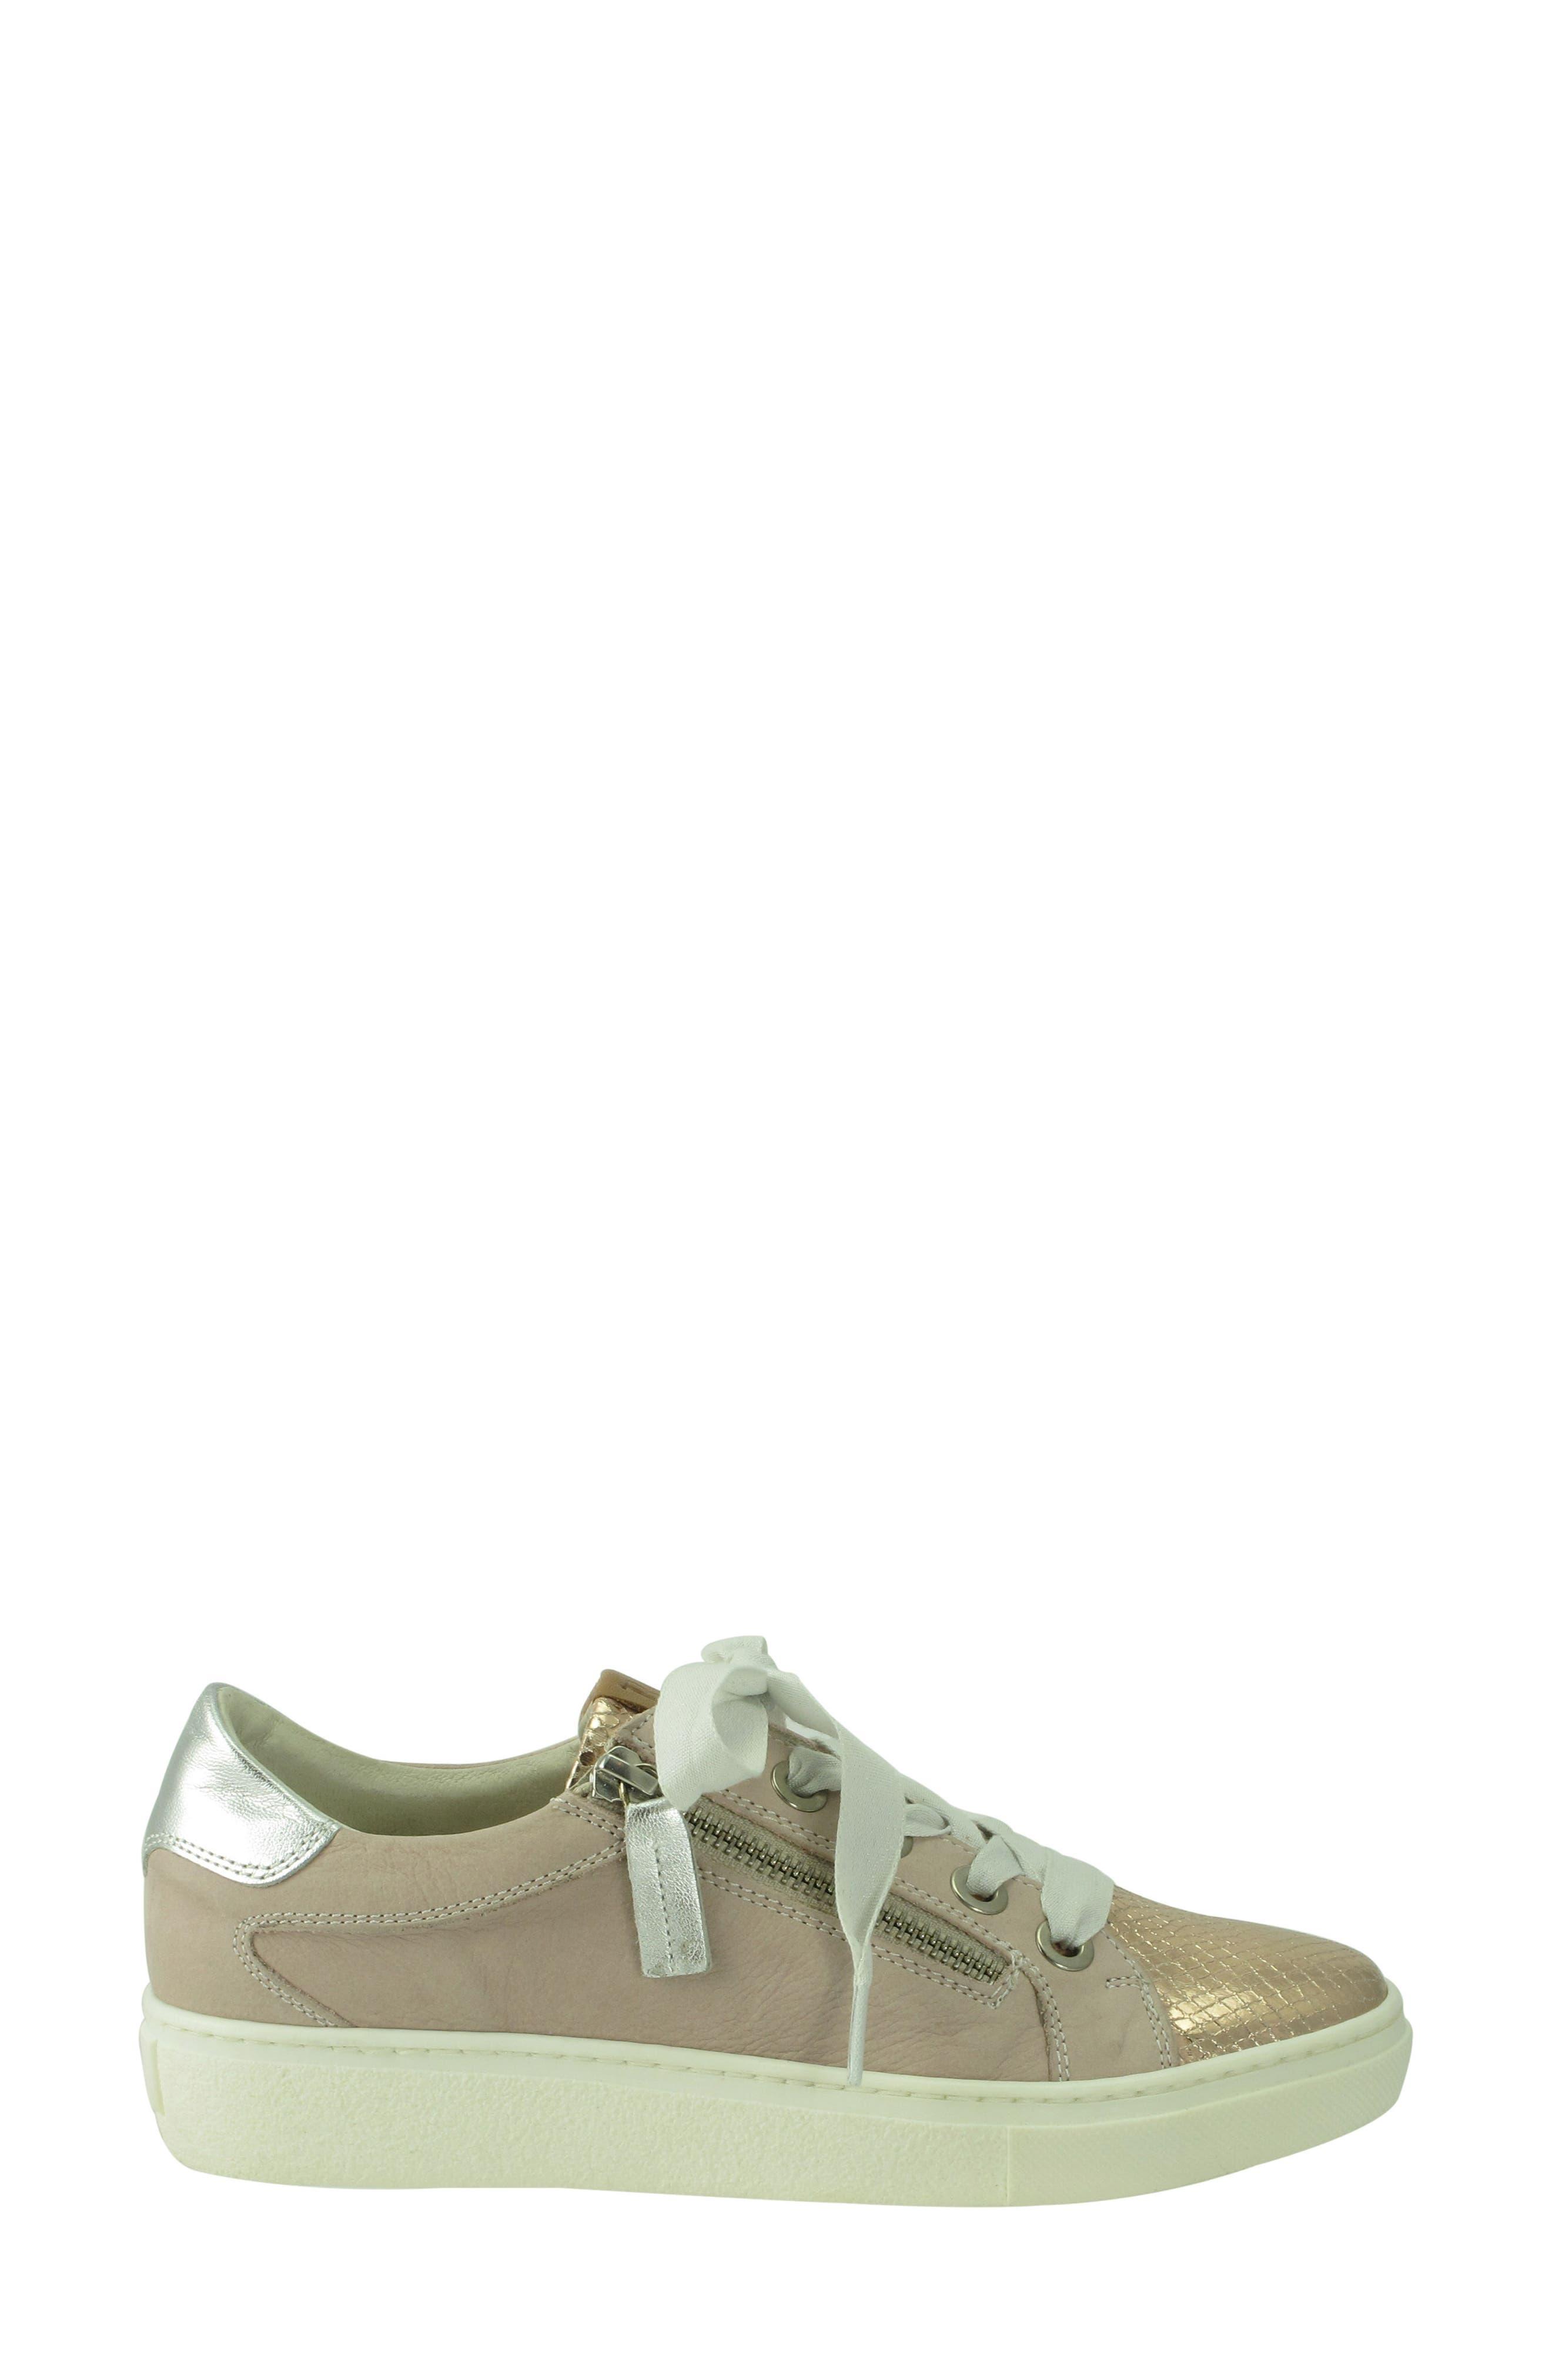 Orabella Weatherproof Sneaker,                             Alternate thumbnail 3, color,                             Blush Nubuck